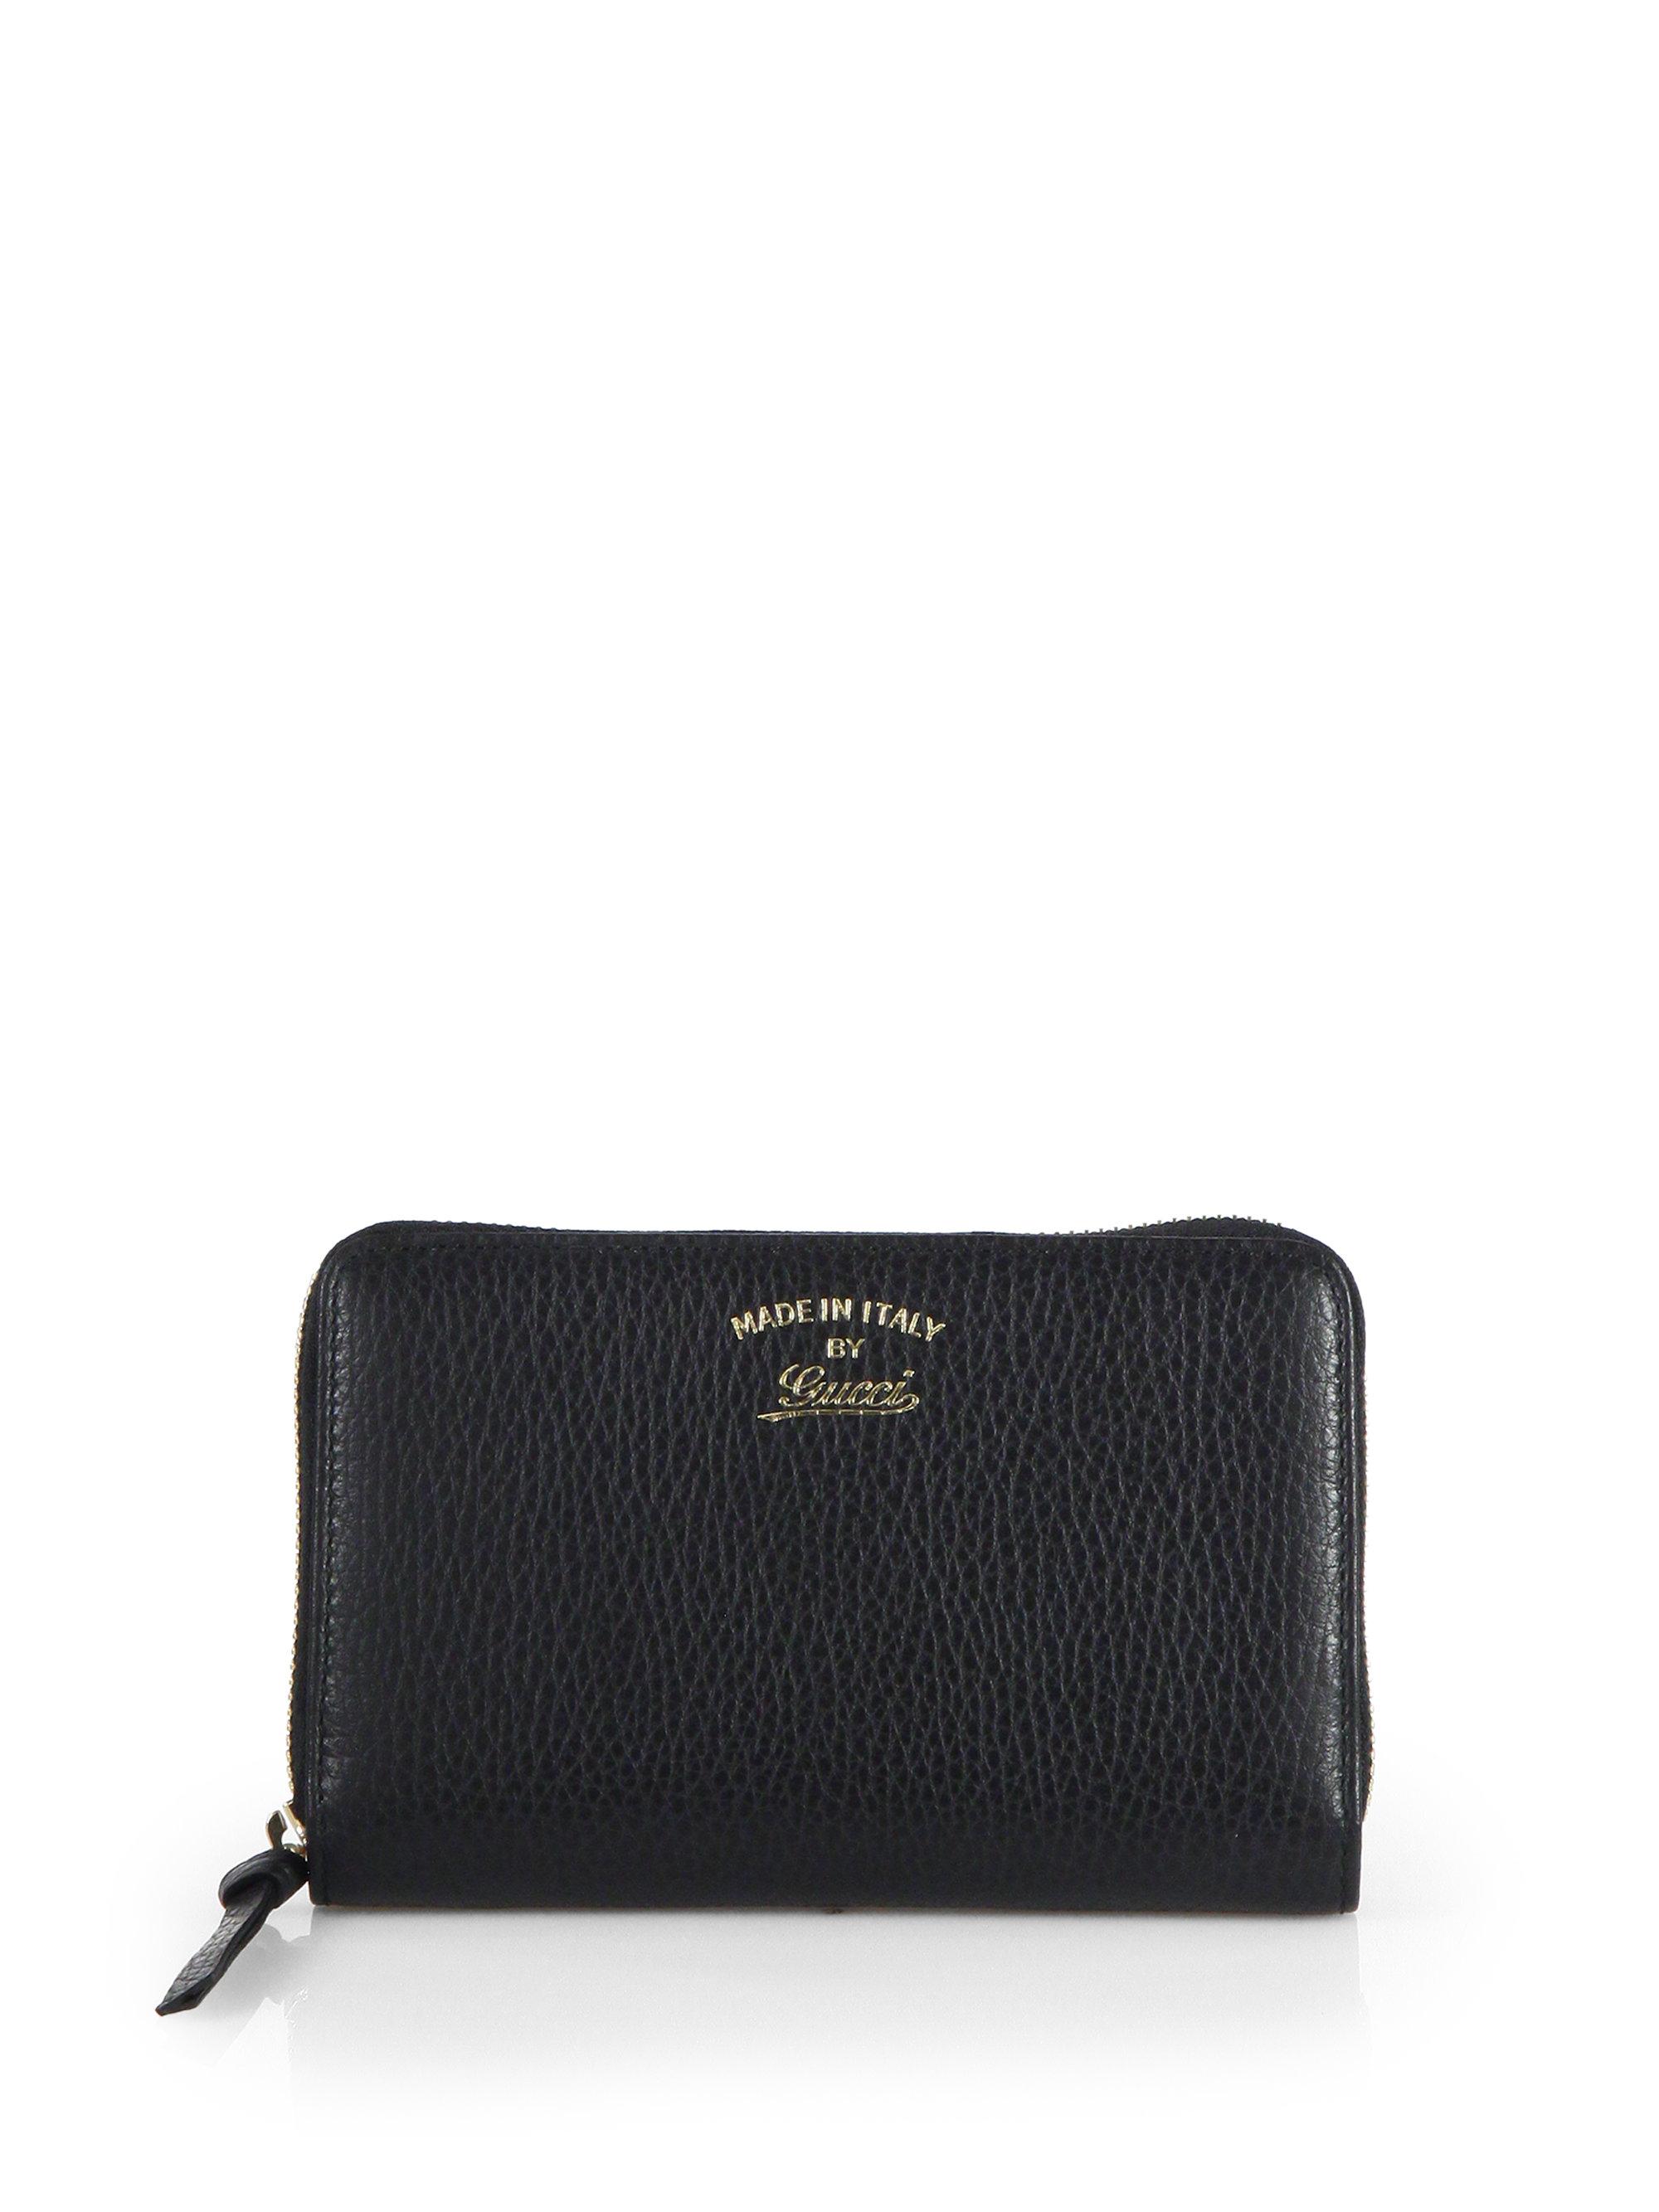 7dd7659781f7 Lyst - Gucci Swing Leather Zip-around Wallet in Black